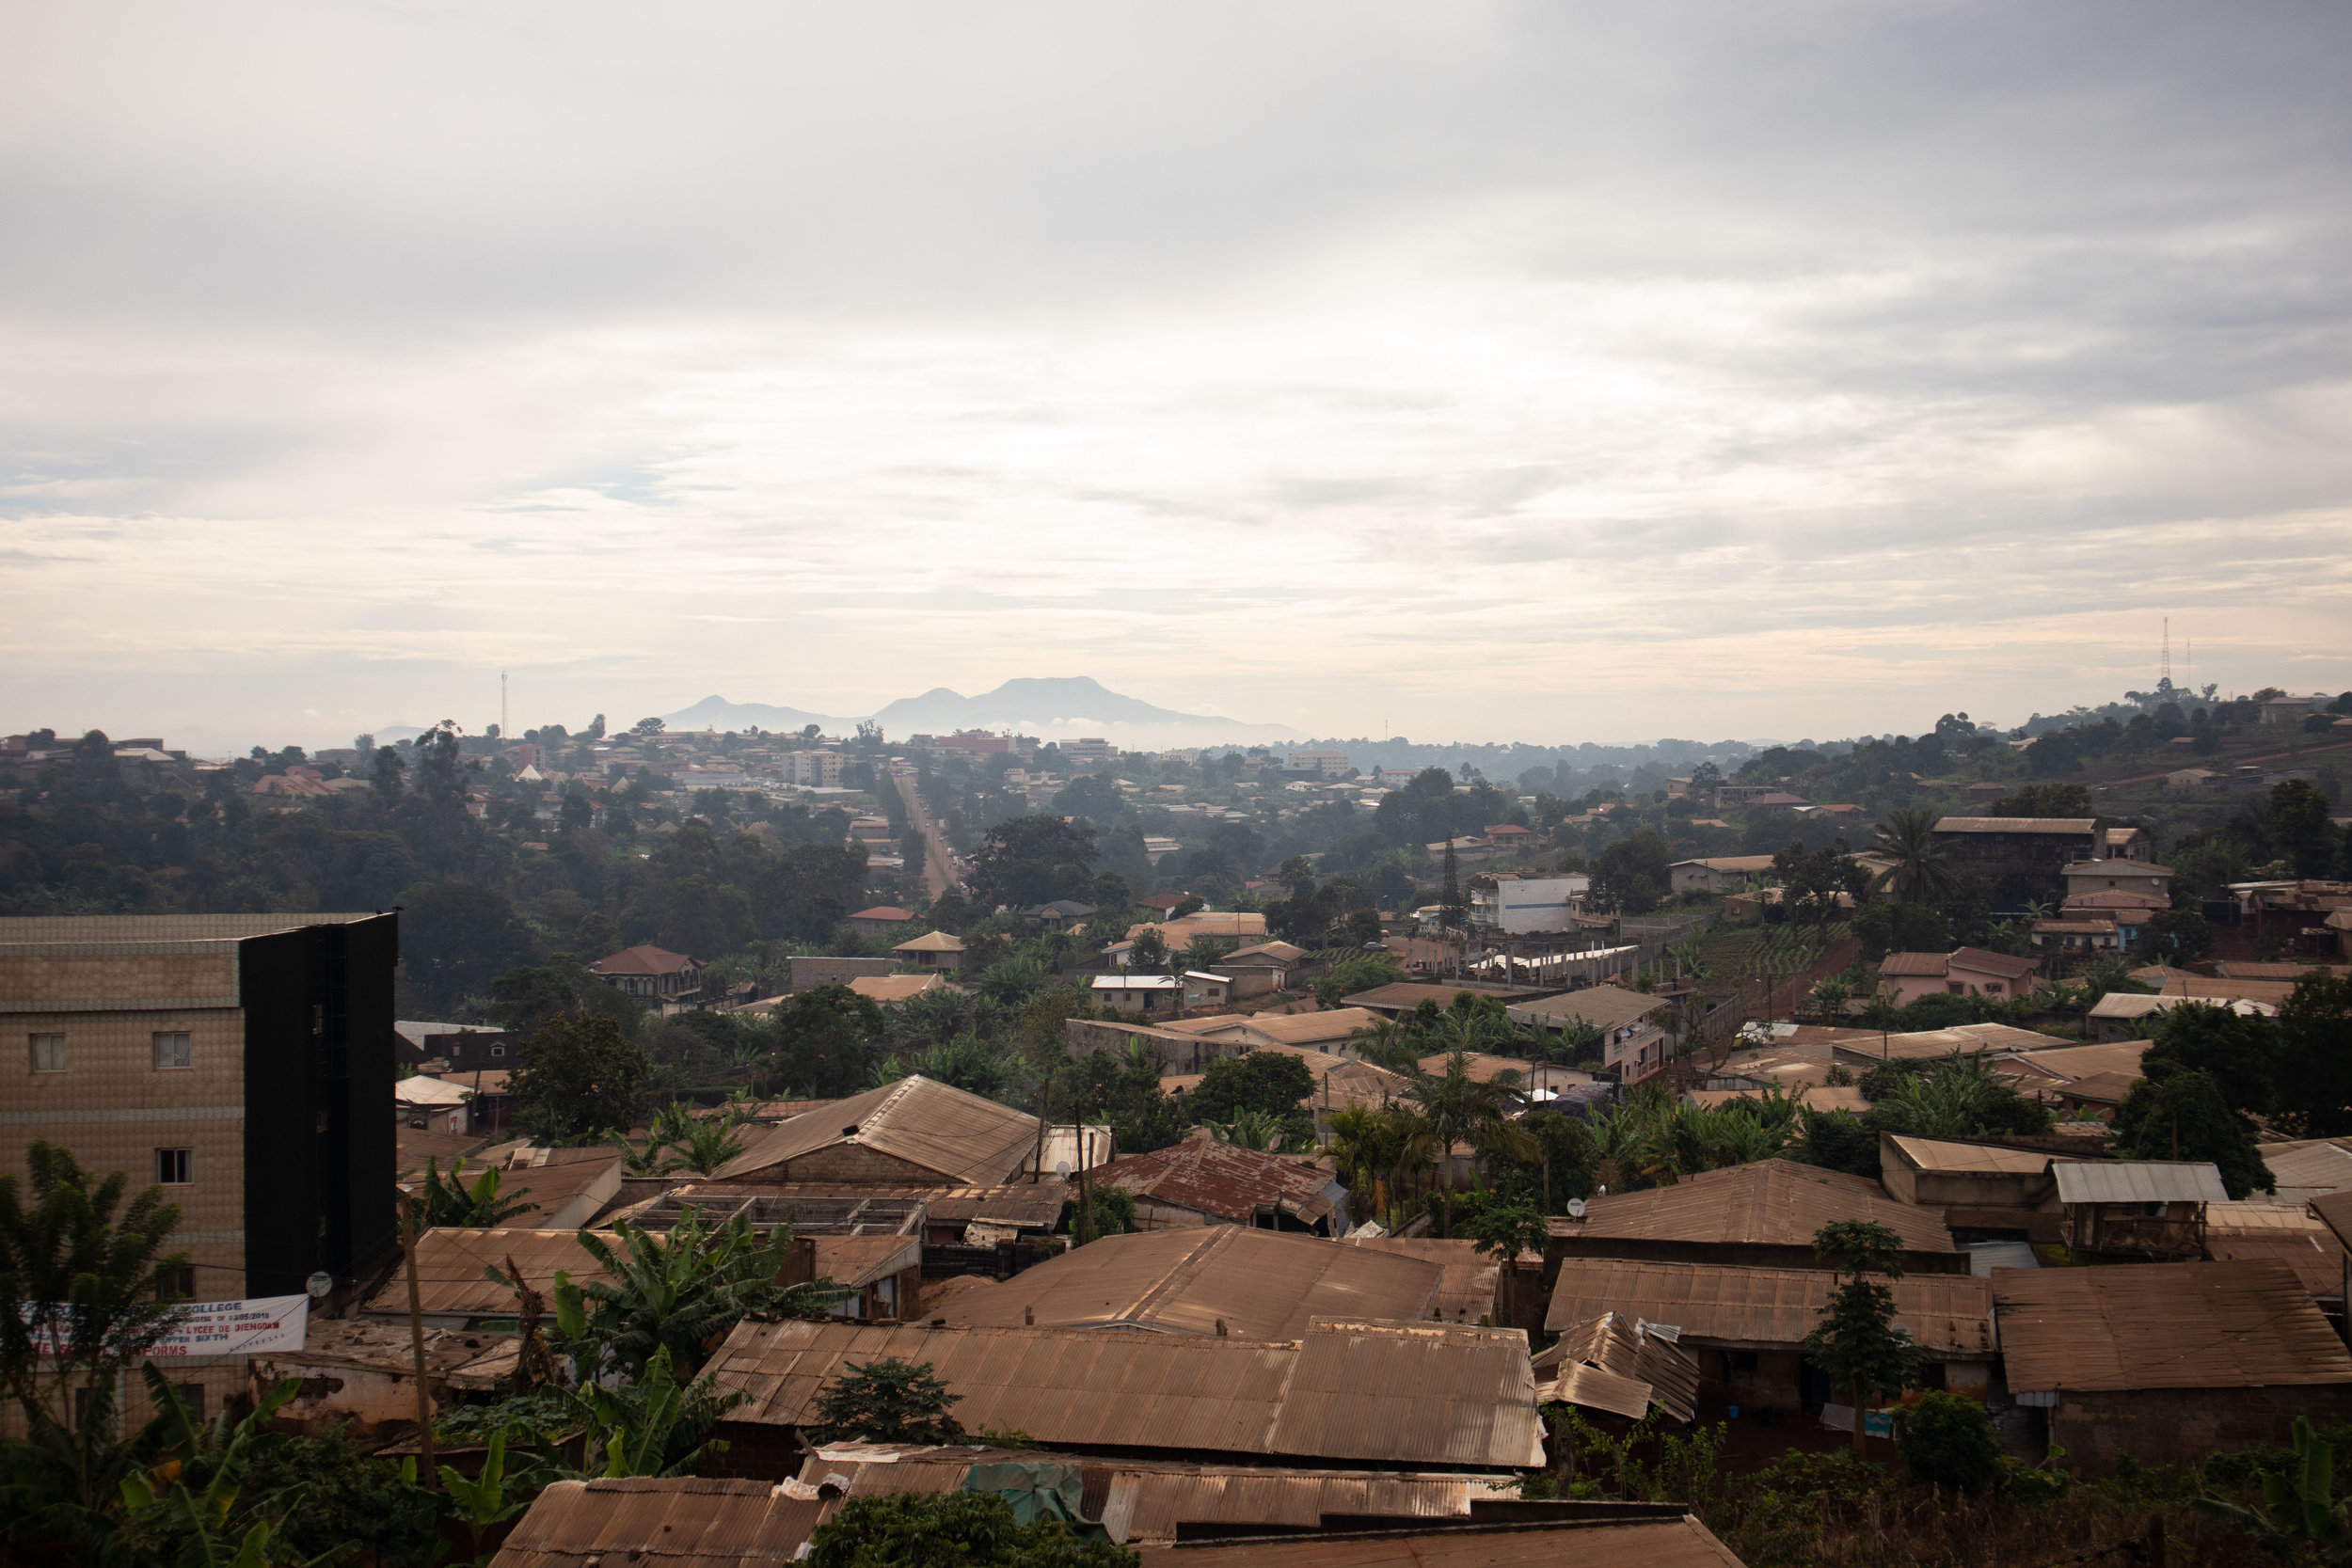 Kameroen_2018_Gilles063.jpg